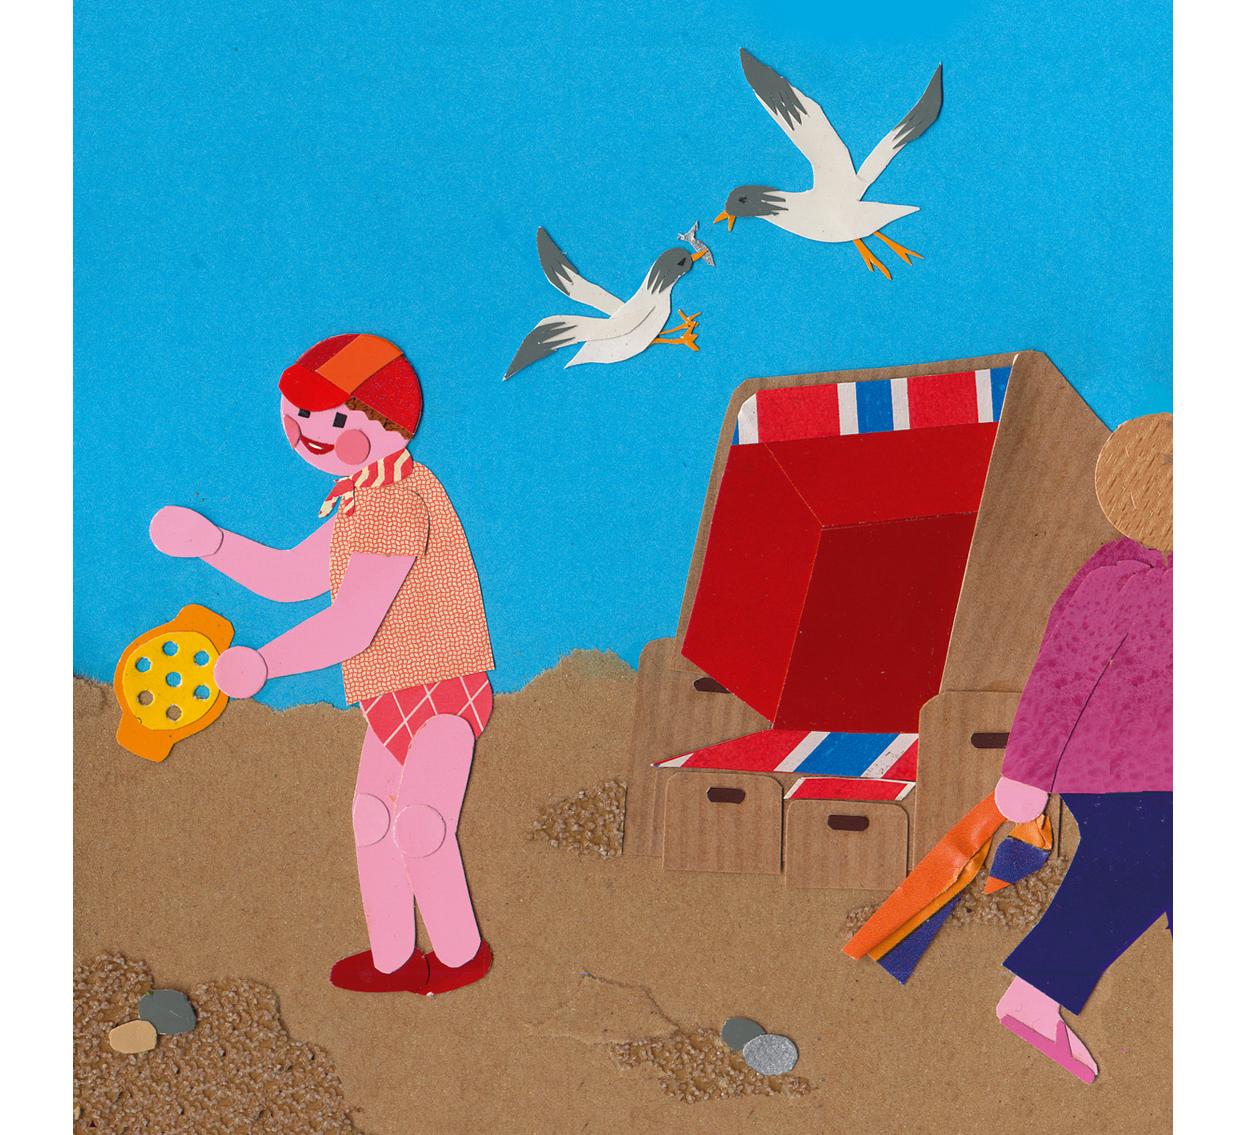 kascha-beyer-illustration-kinderbuch-riemels-01